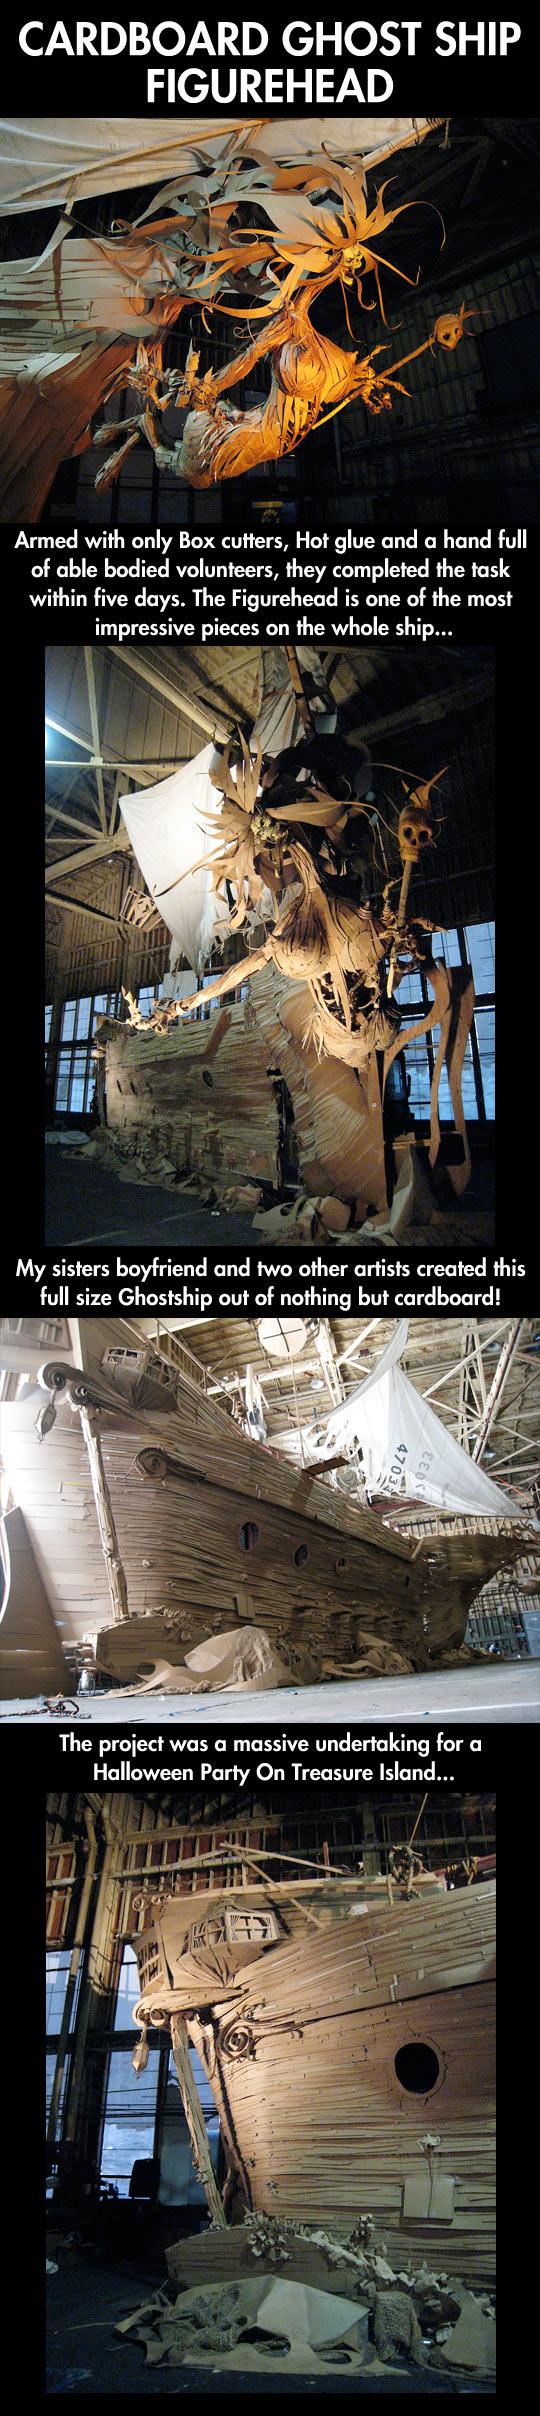 Amazing cardboard art…